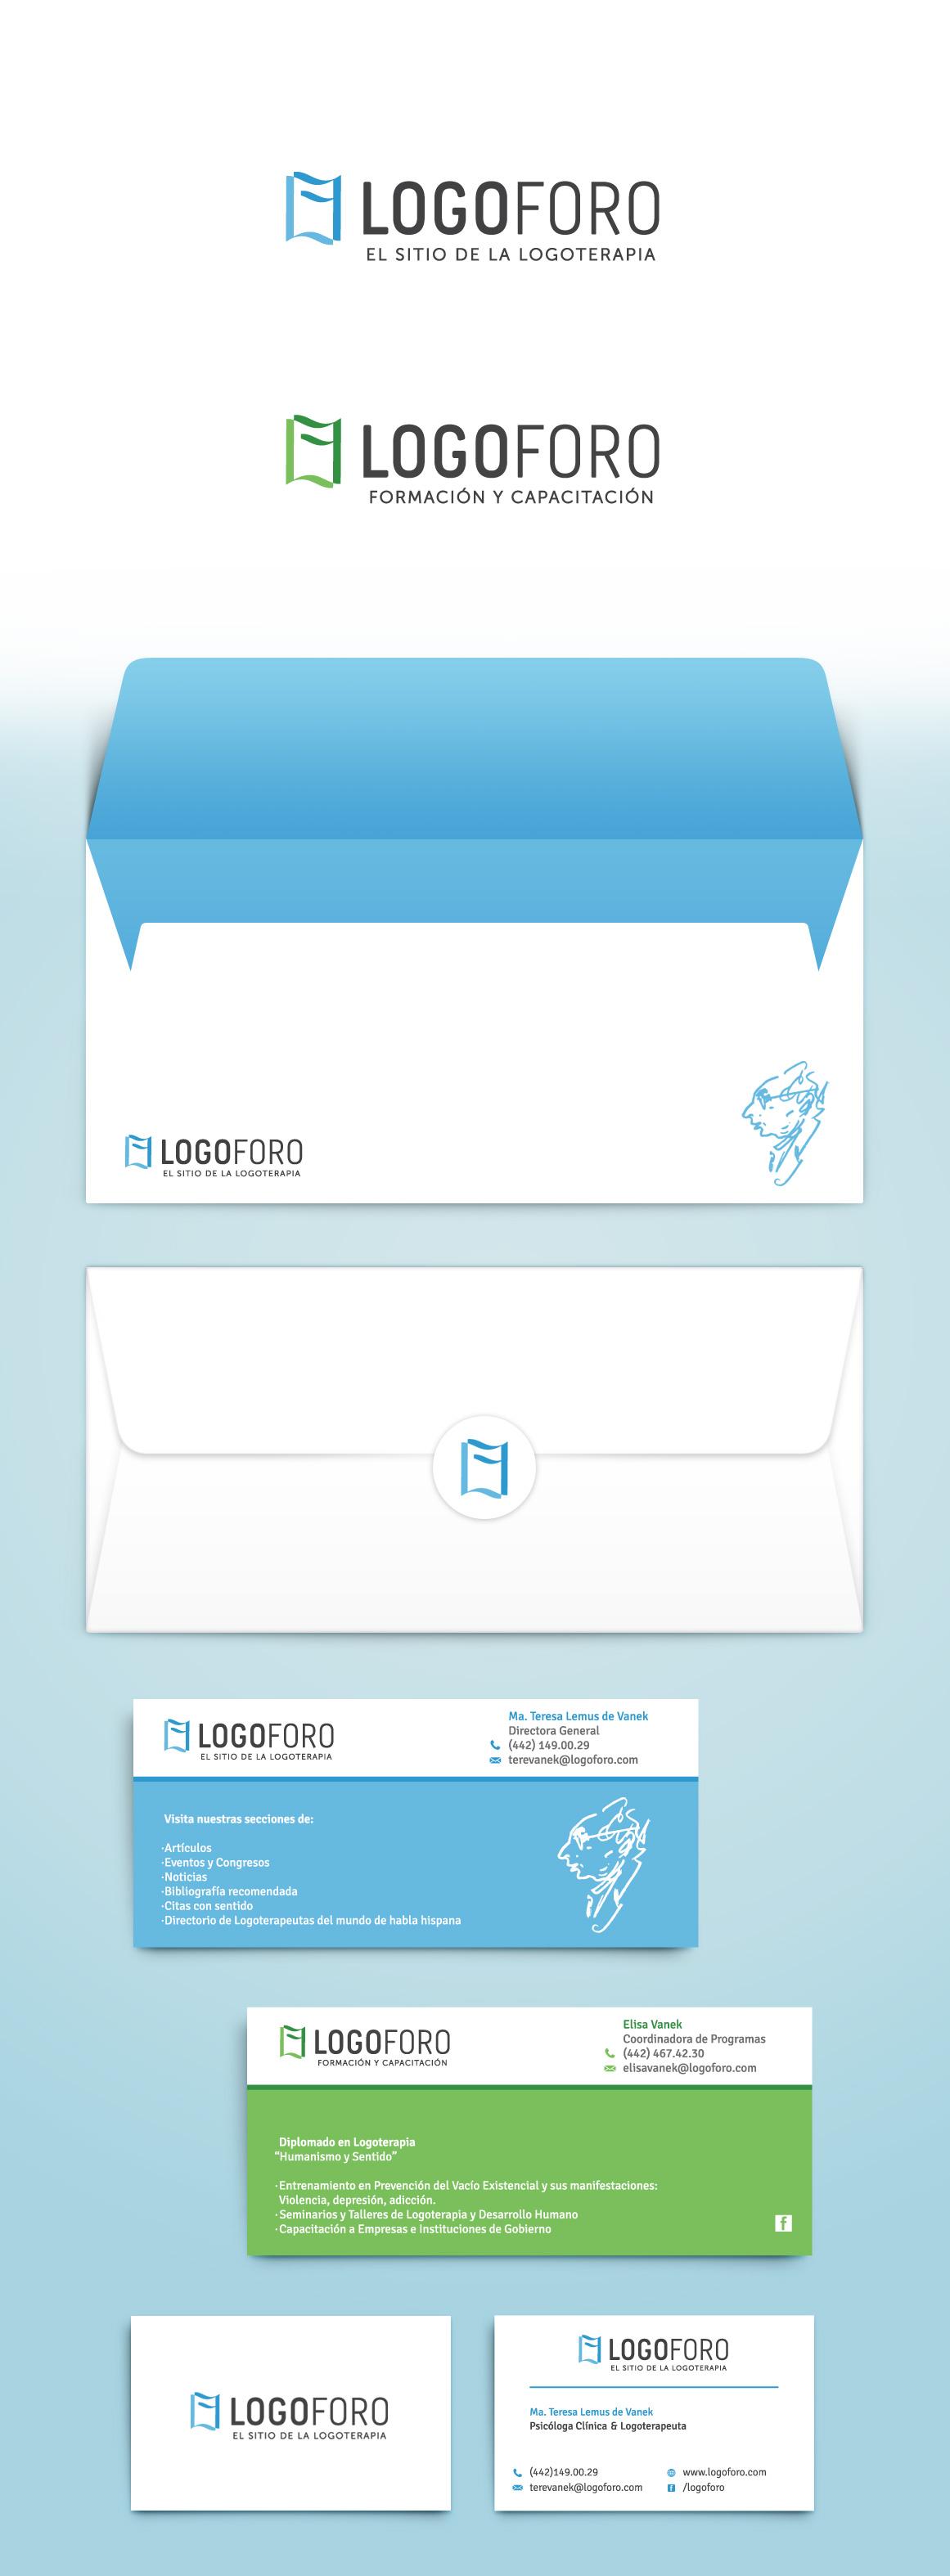 logoforo_branding_design_logo_diseno